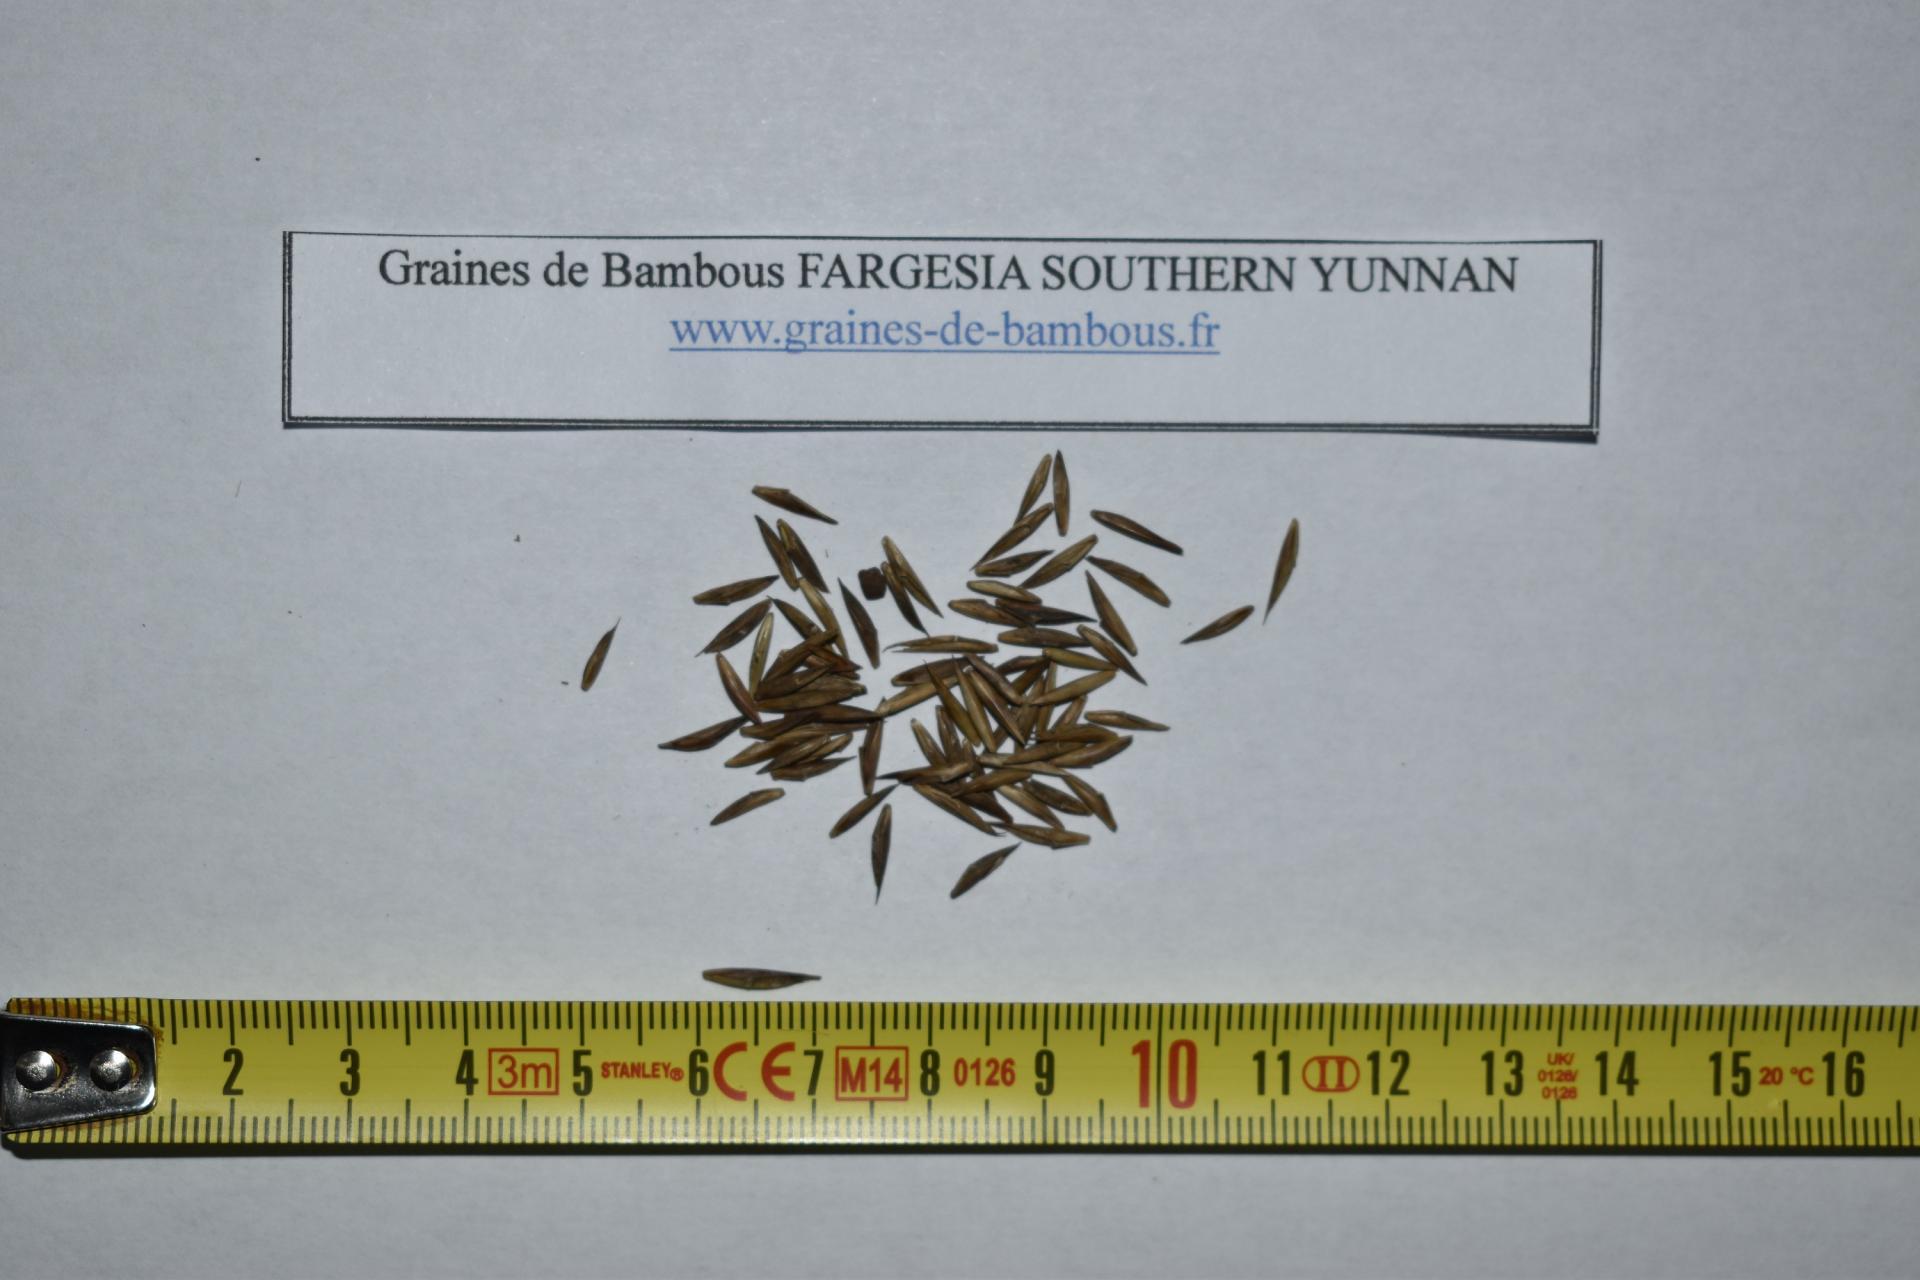 Seeds fargesia southern yunnan graines de bambous fr